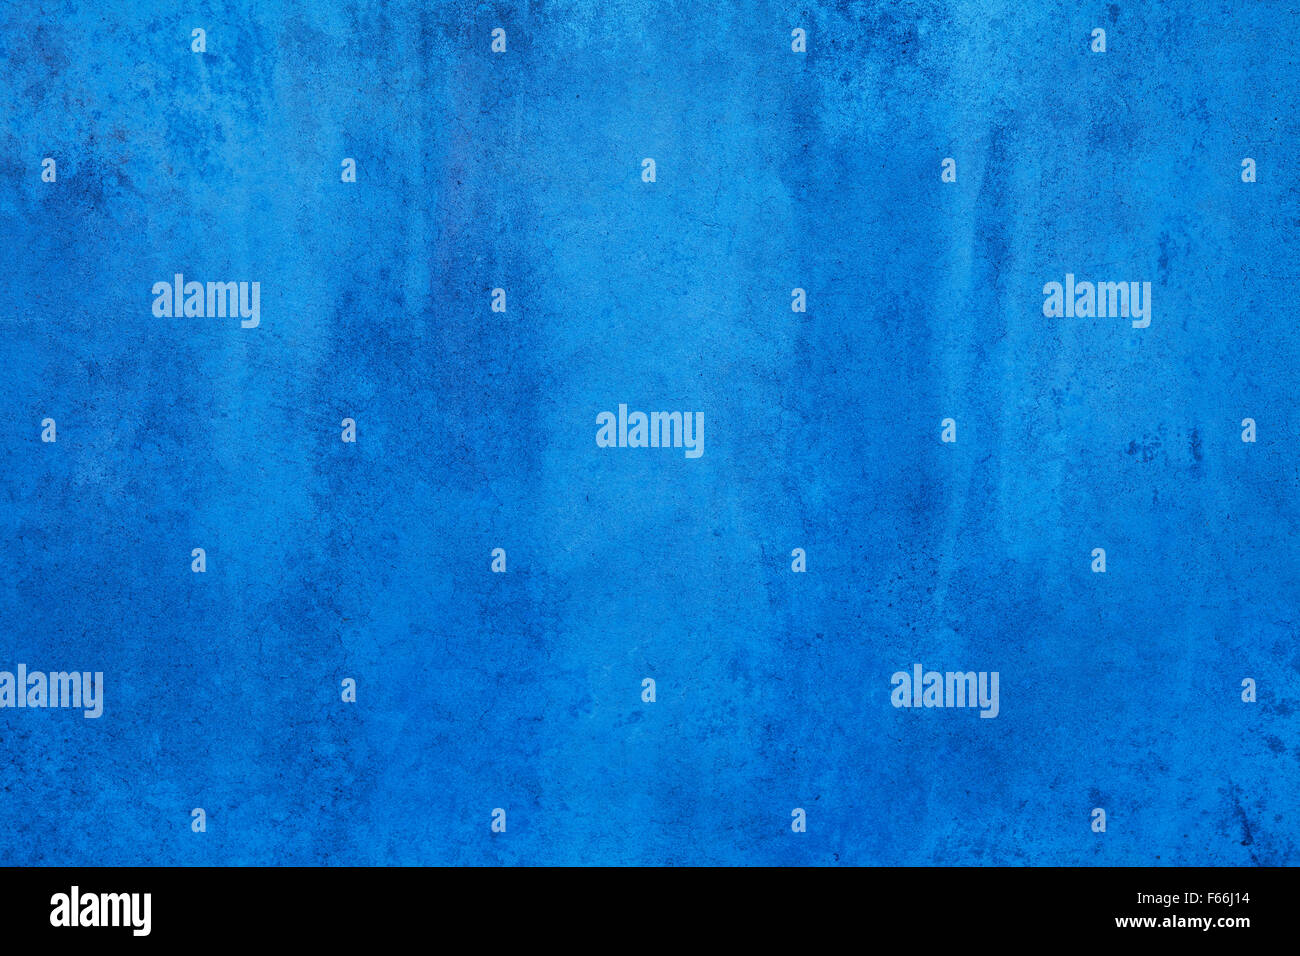 Rough Texture Background: Rough Blue Grunge Texture Background Stock Photos & Rough